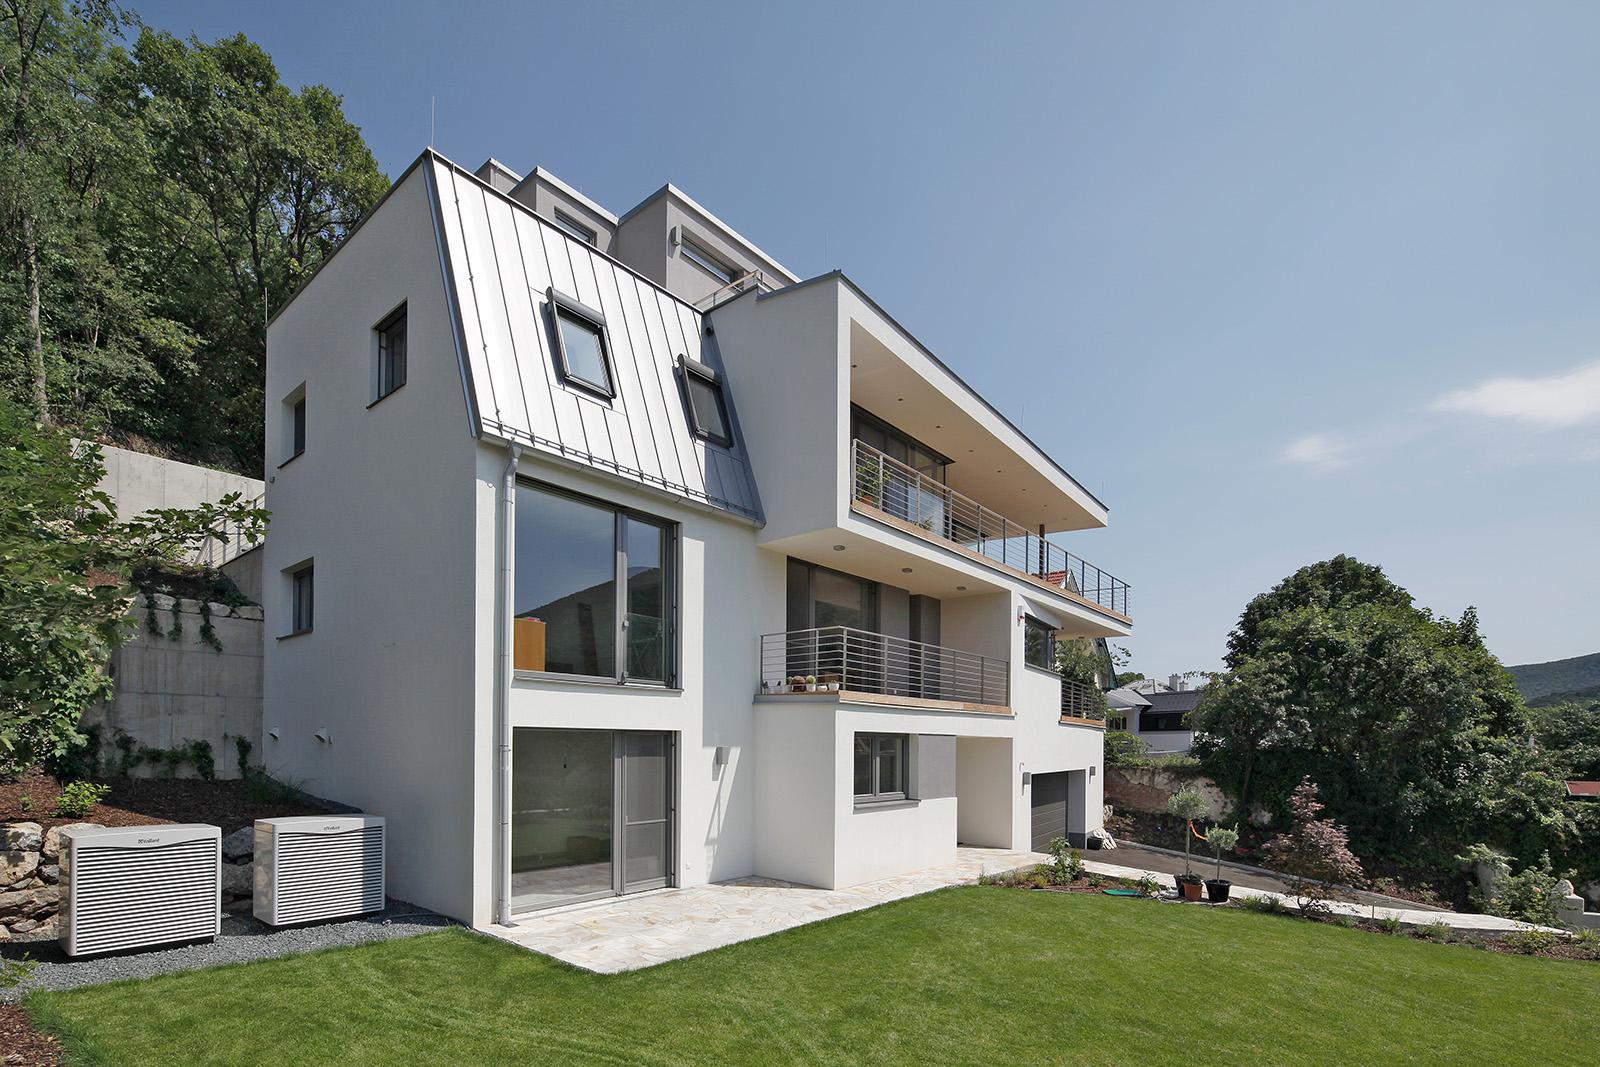 wunschhaus-haus-gh4-3